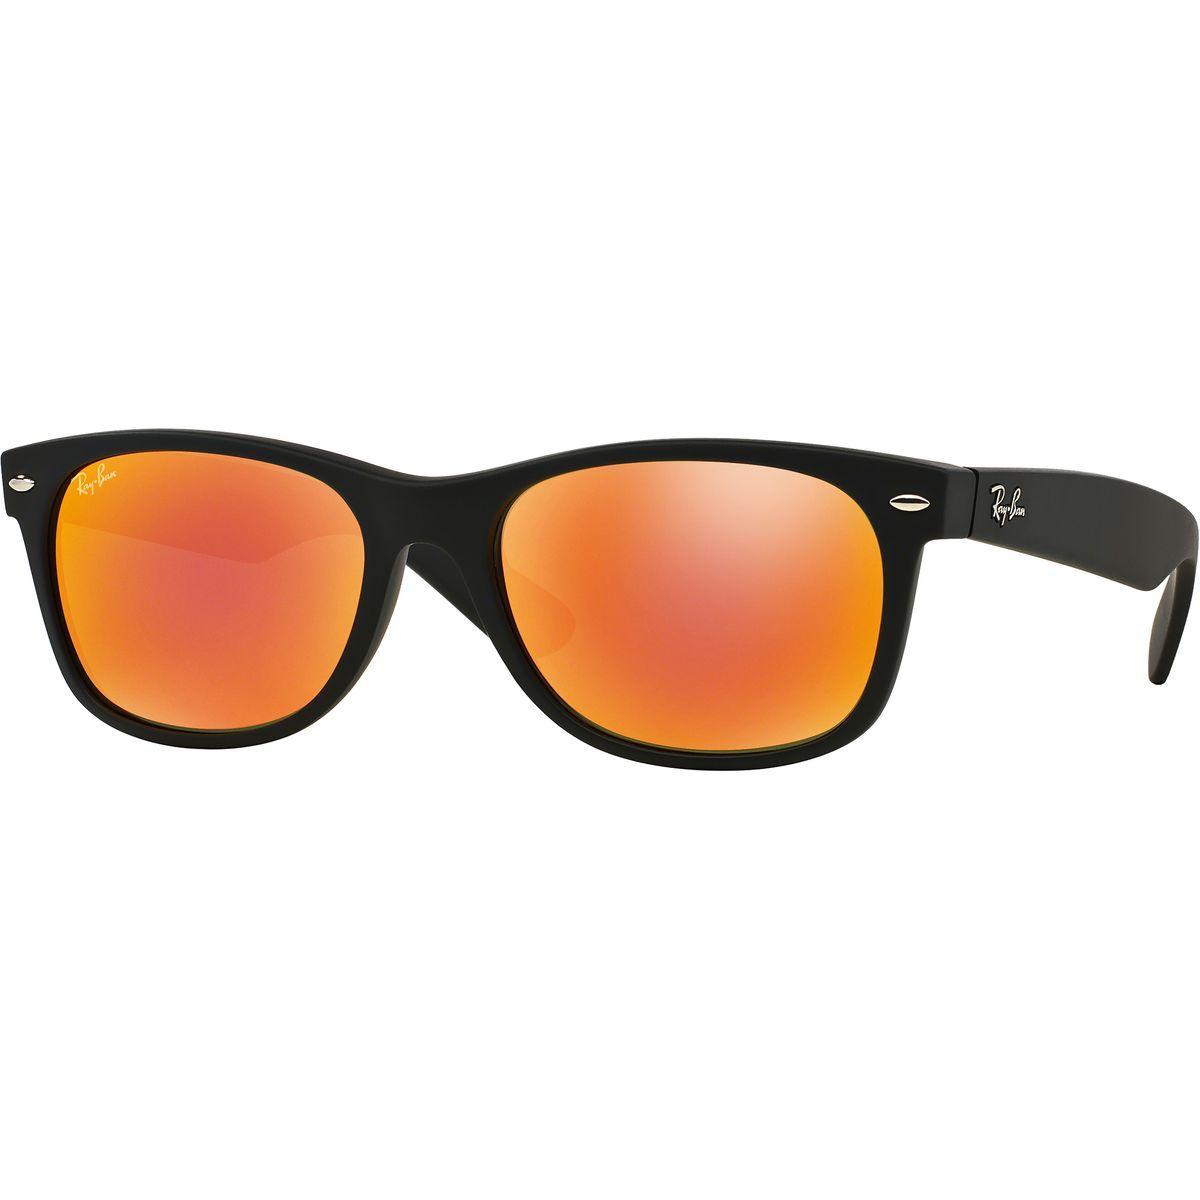 f5a5990d64d https   www.lyst.com accessories ray-ban-new-wayfarer-sunglasses ...